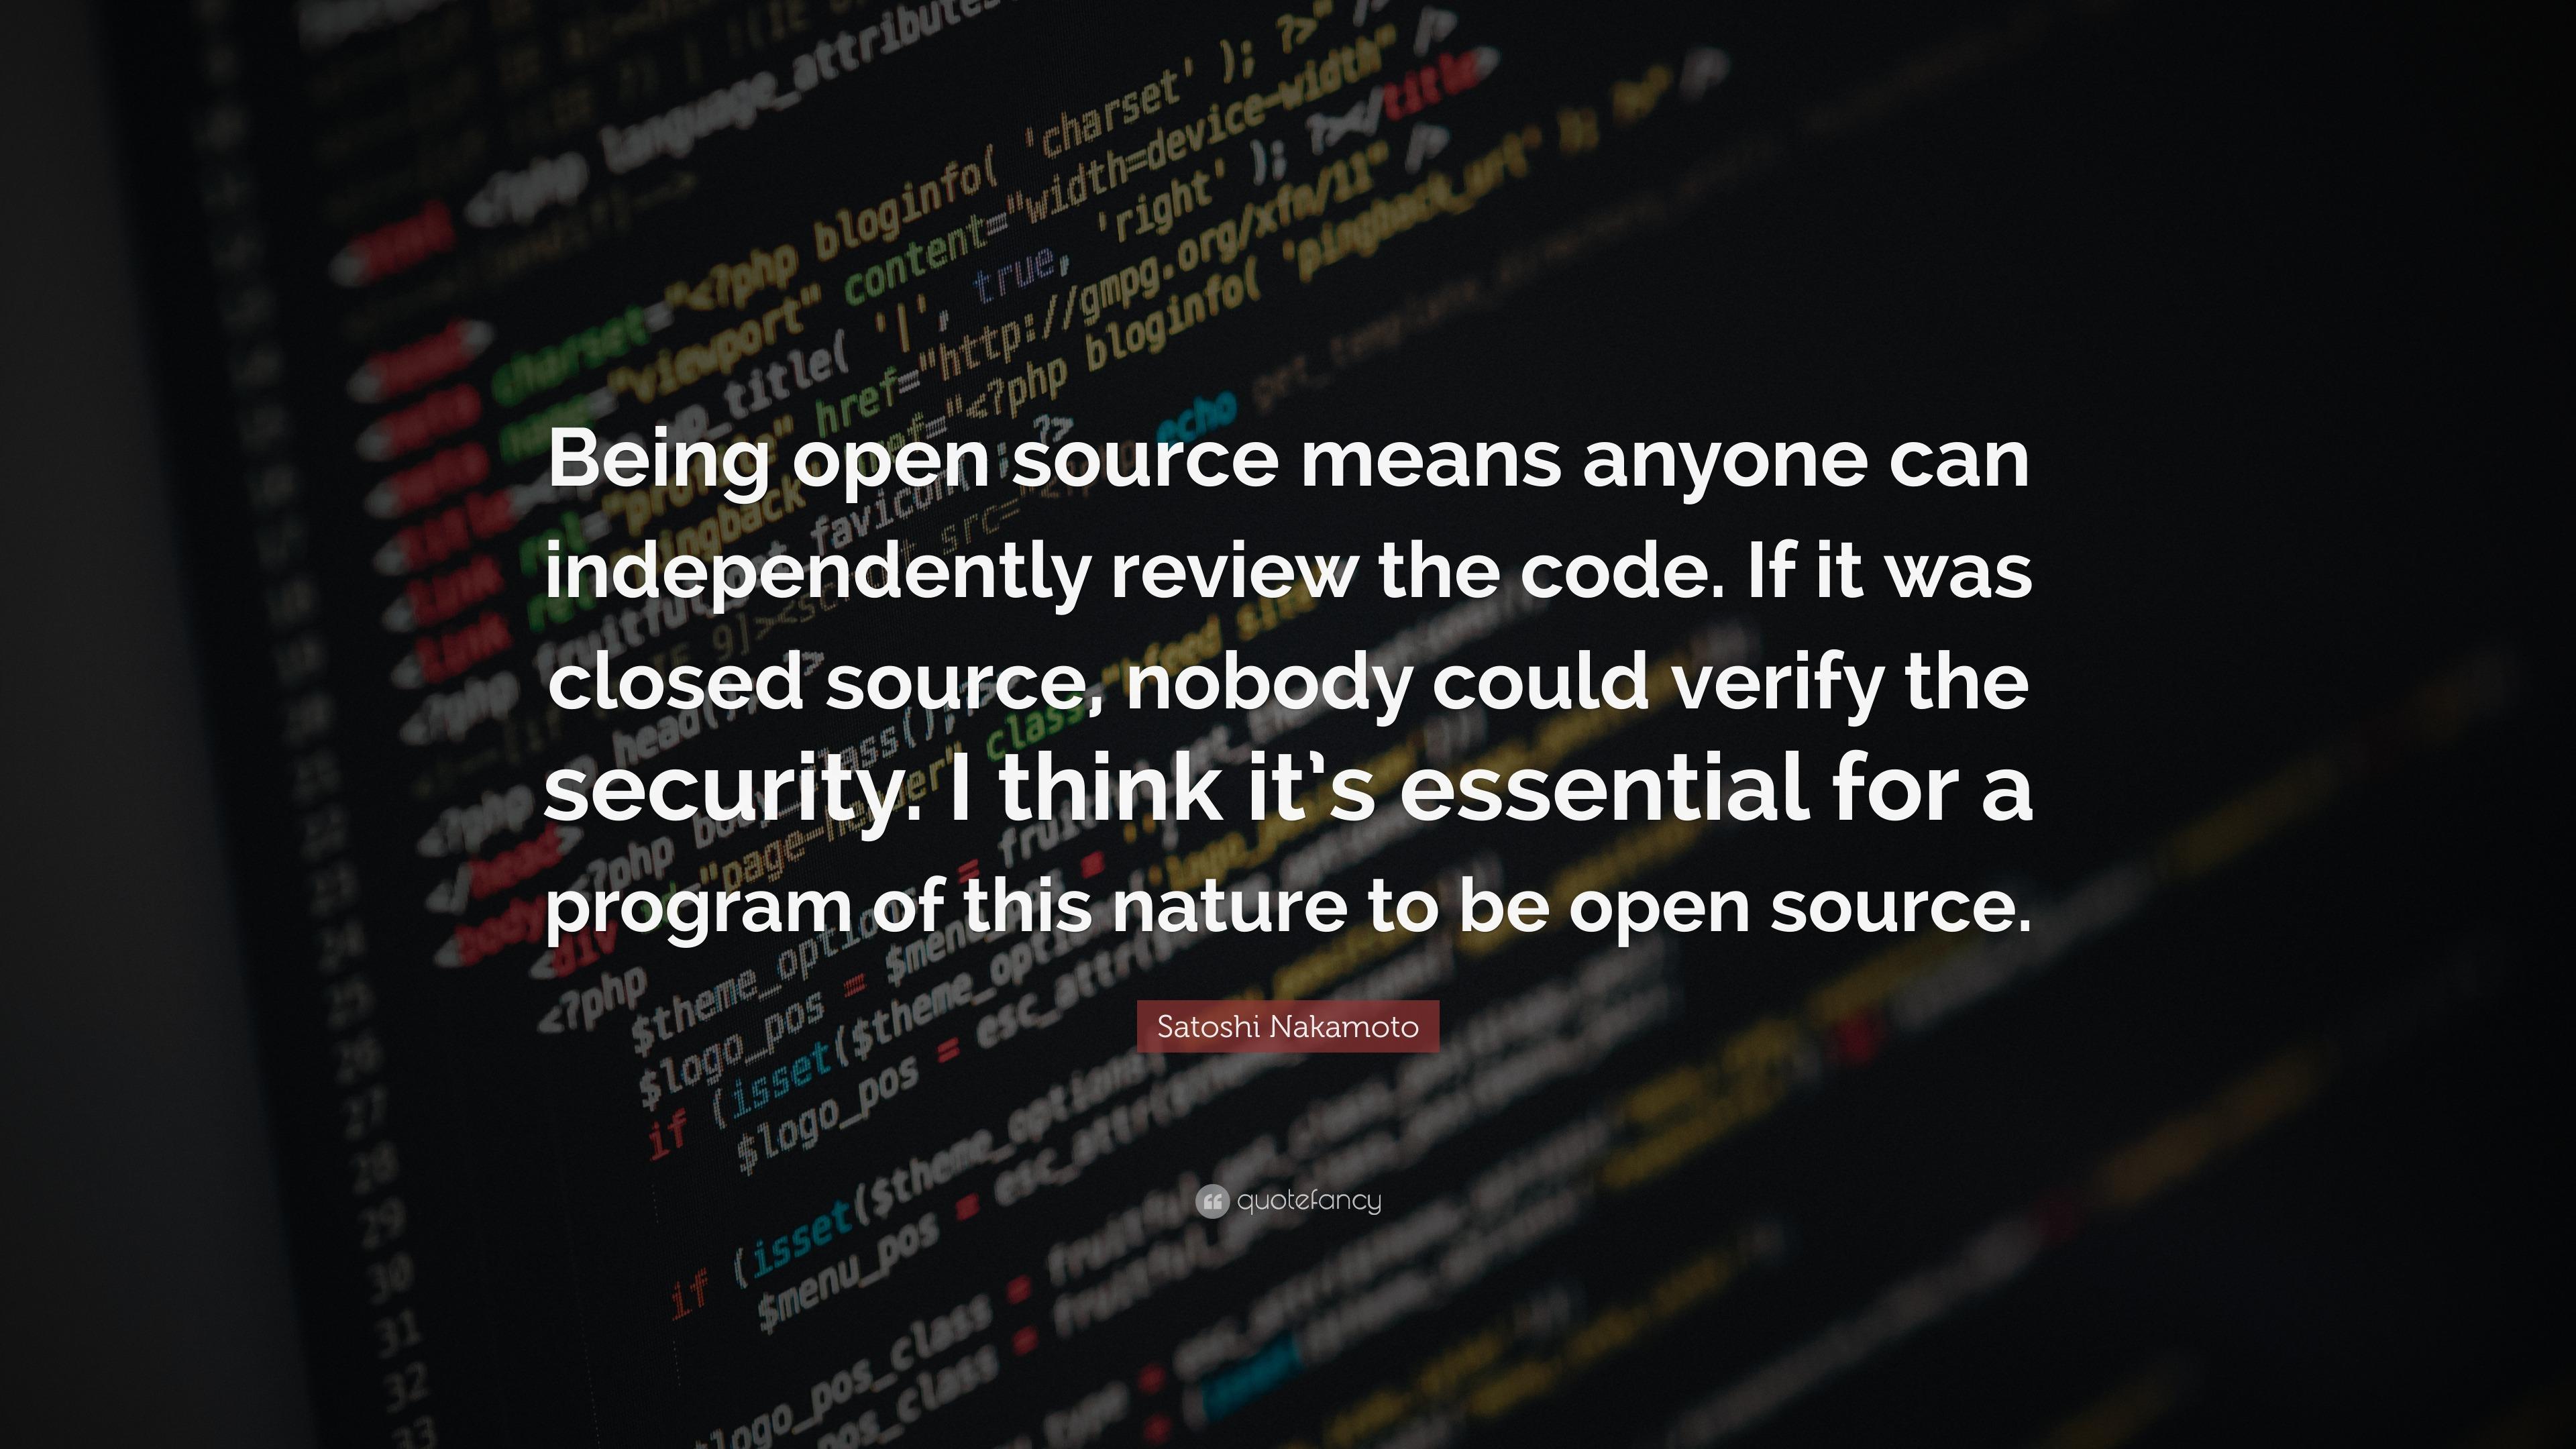 open source video surveillance application